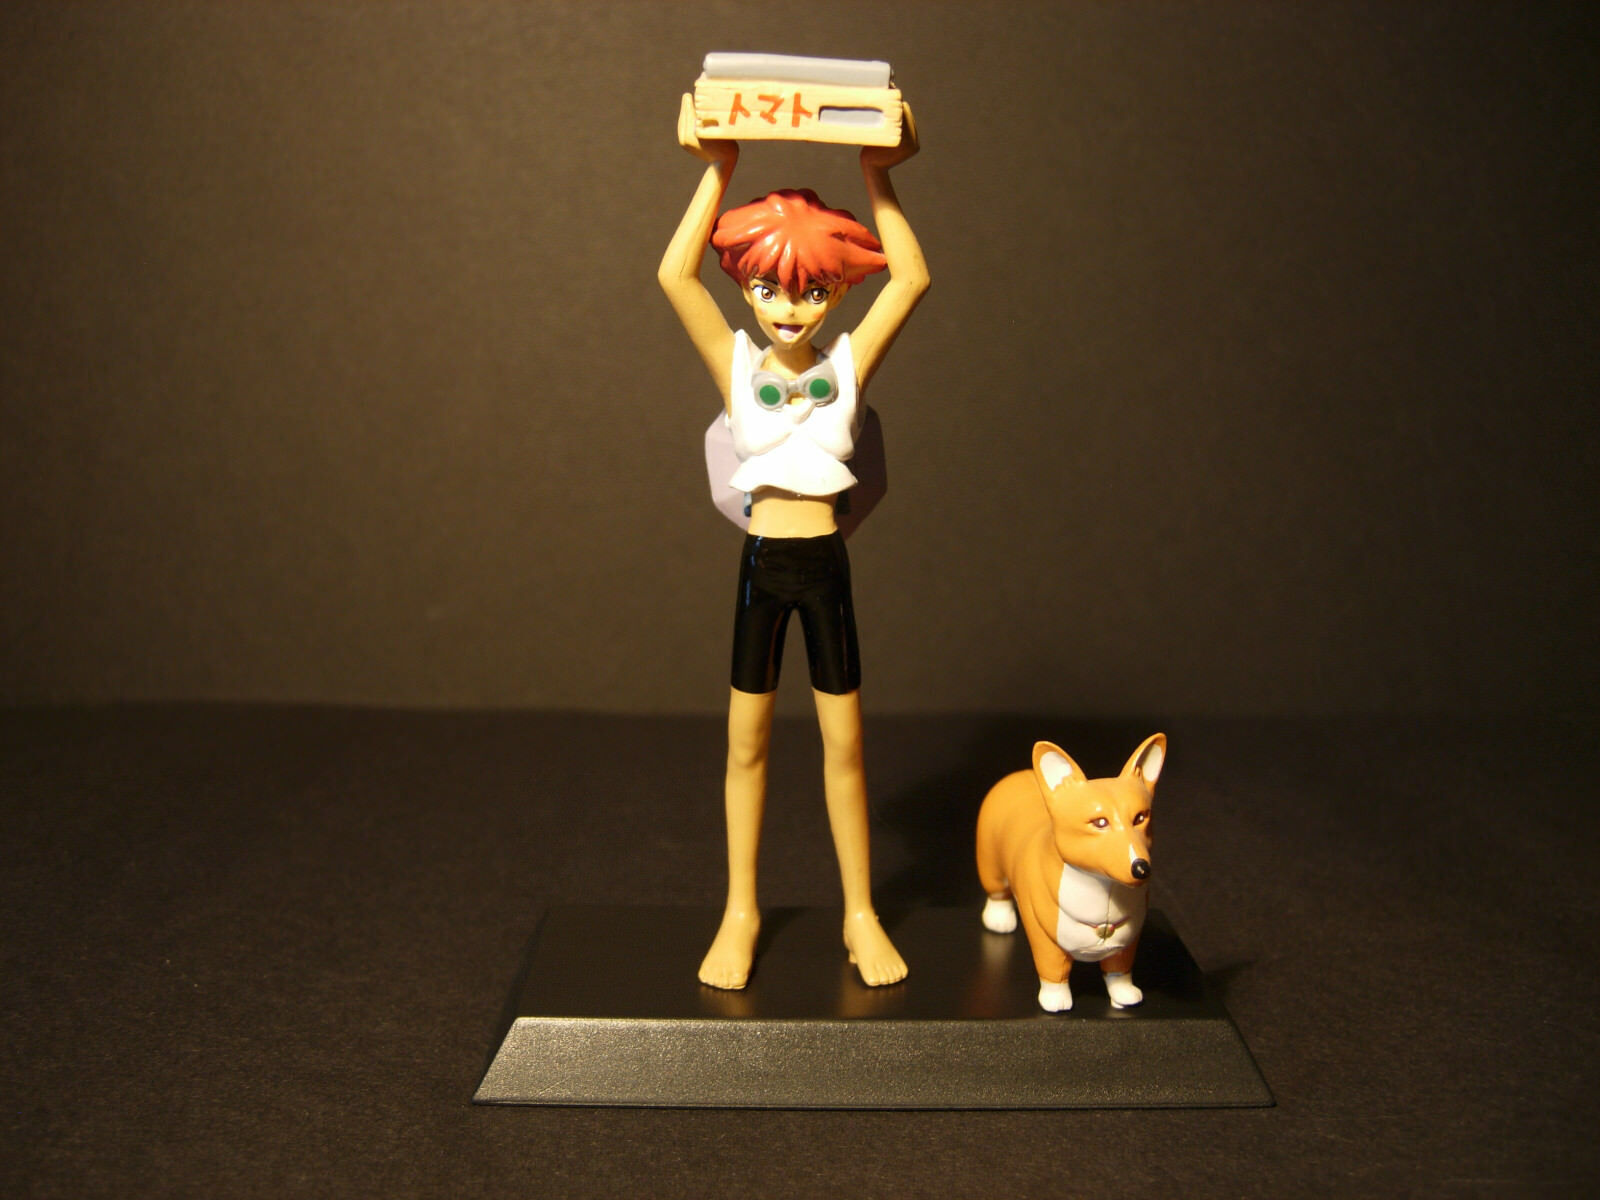 Cowboy Bebop - Edward & Ein  - Very Rare mini figurine - Without original box